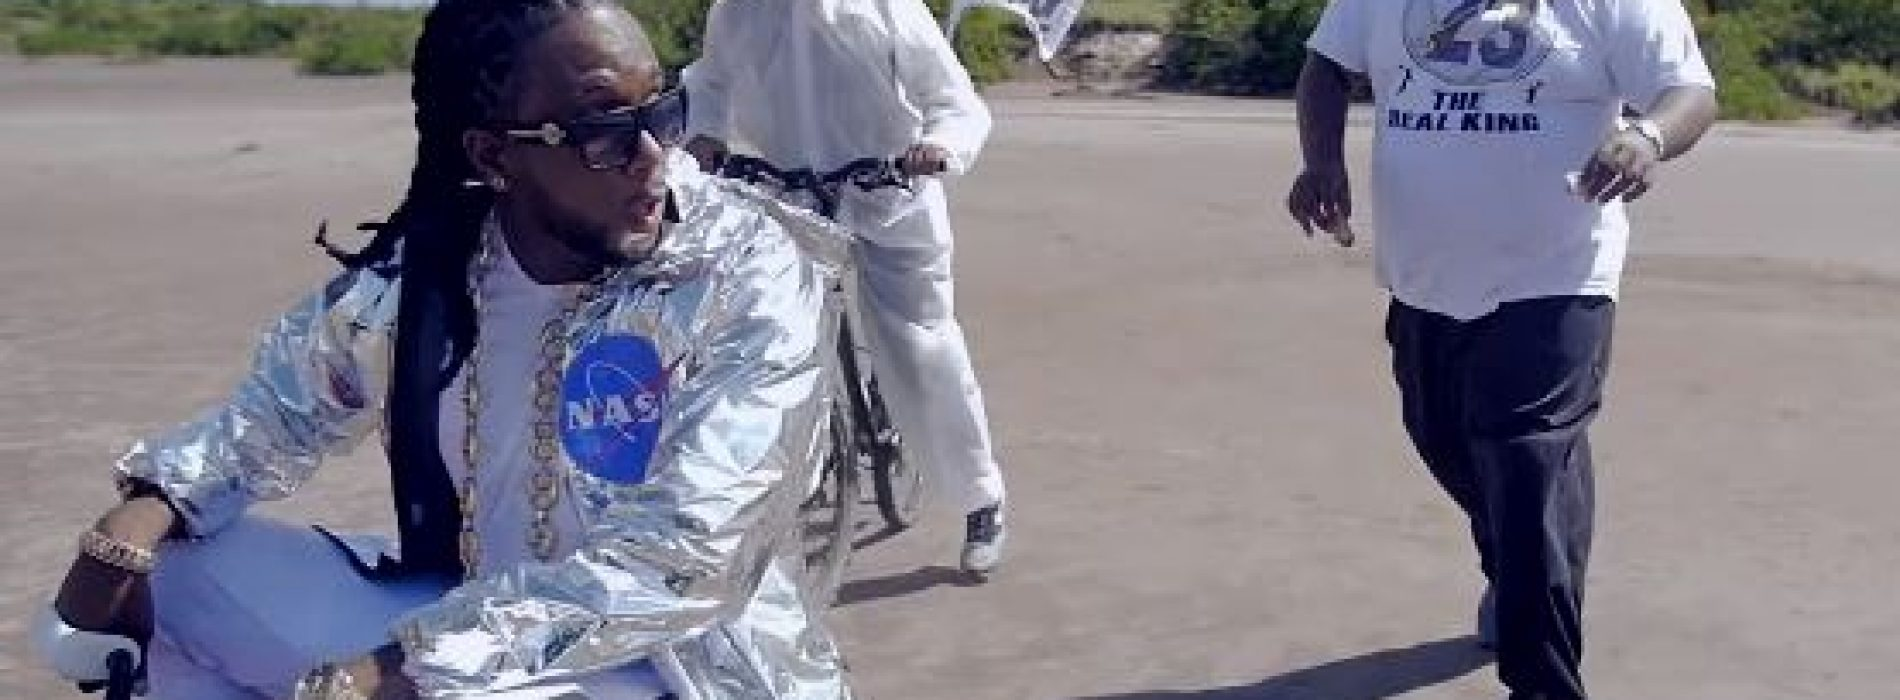 Découvre la parodie du dernier clip de Kalash – Mwaka Moon ft. Damso /BOBI – Kakamoon ft. Damsgro – Novembre 2017